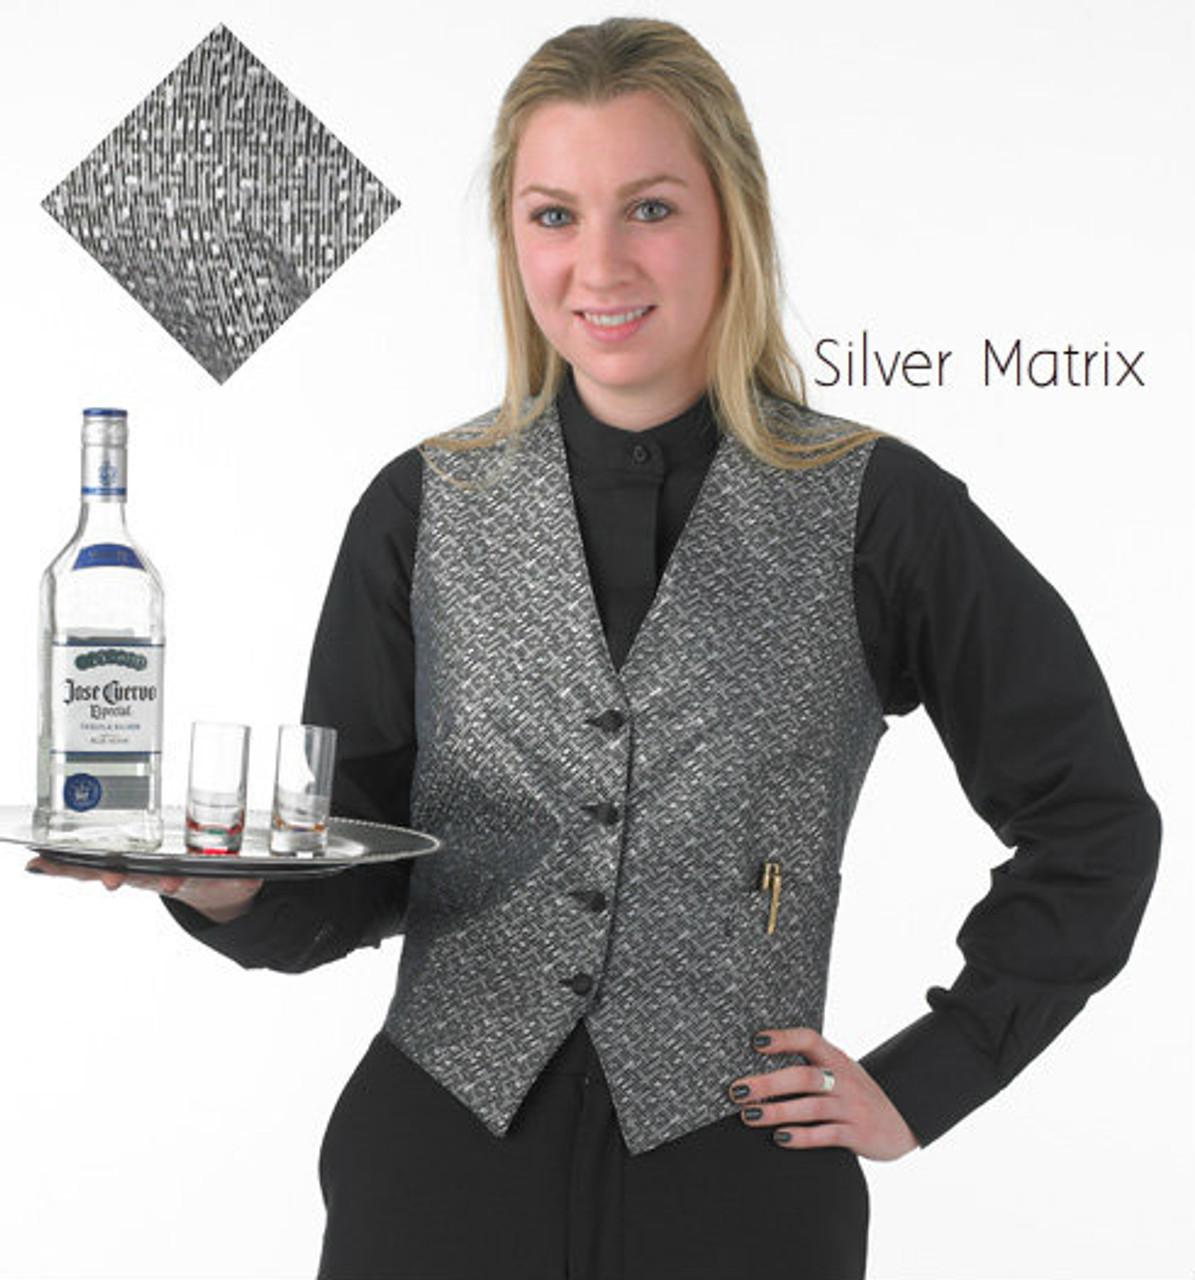 Silver Matrix